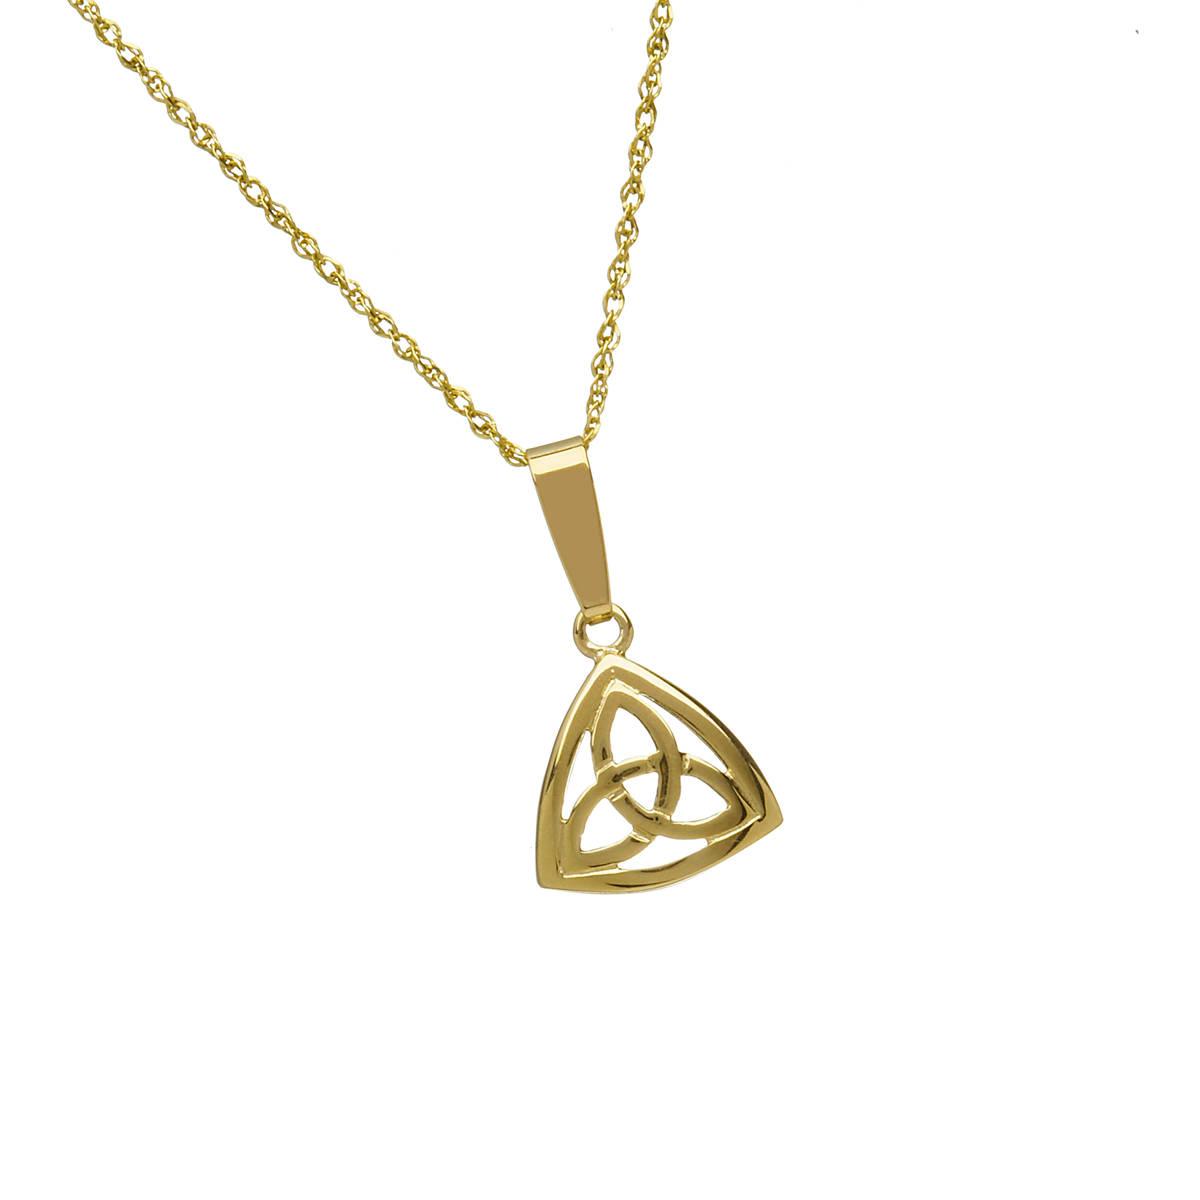 10 carat yellow gold trinity knot pendant with bezel.